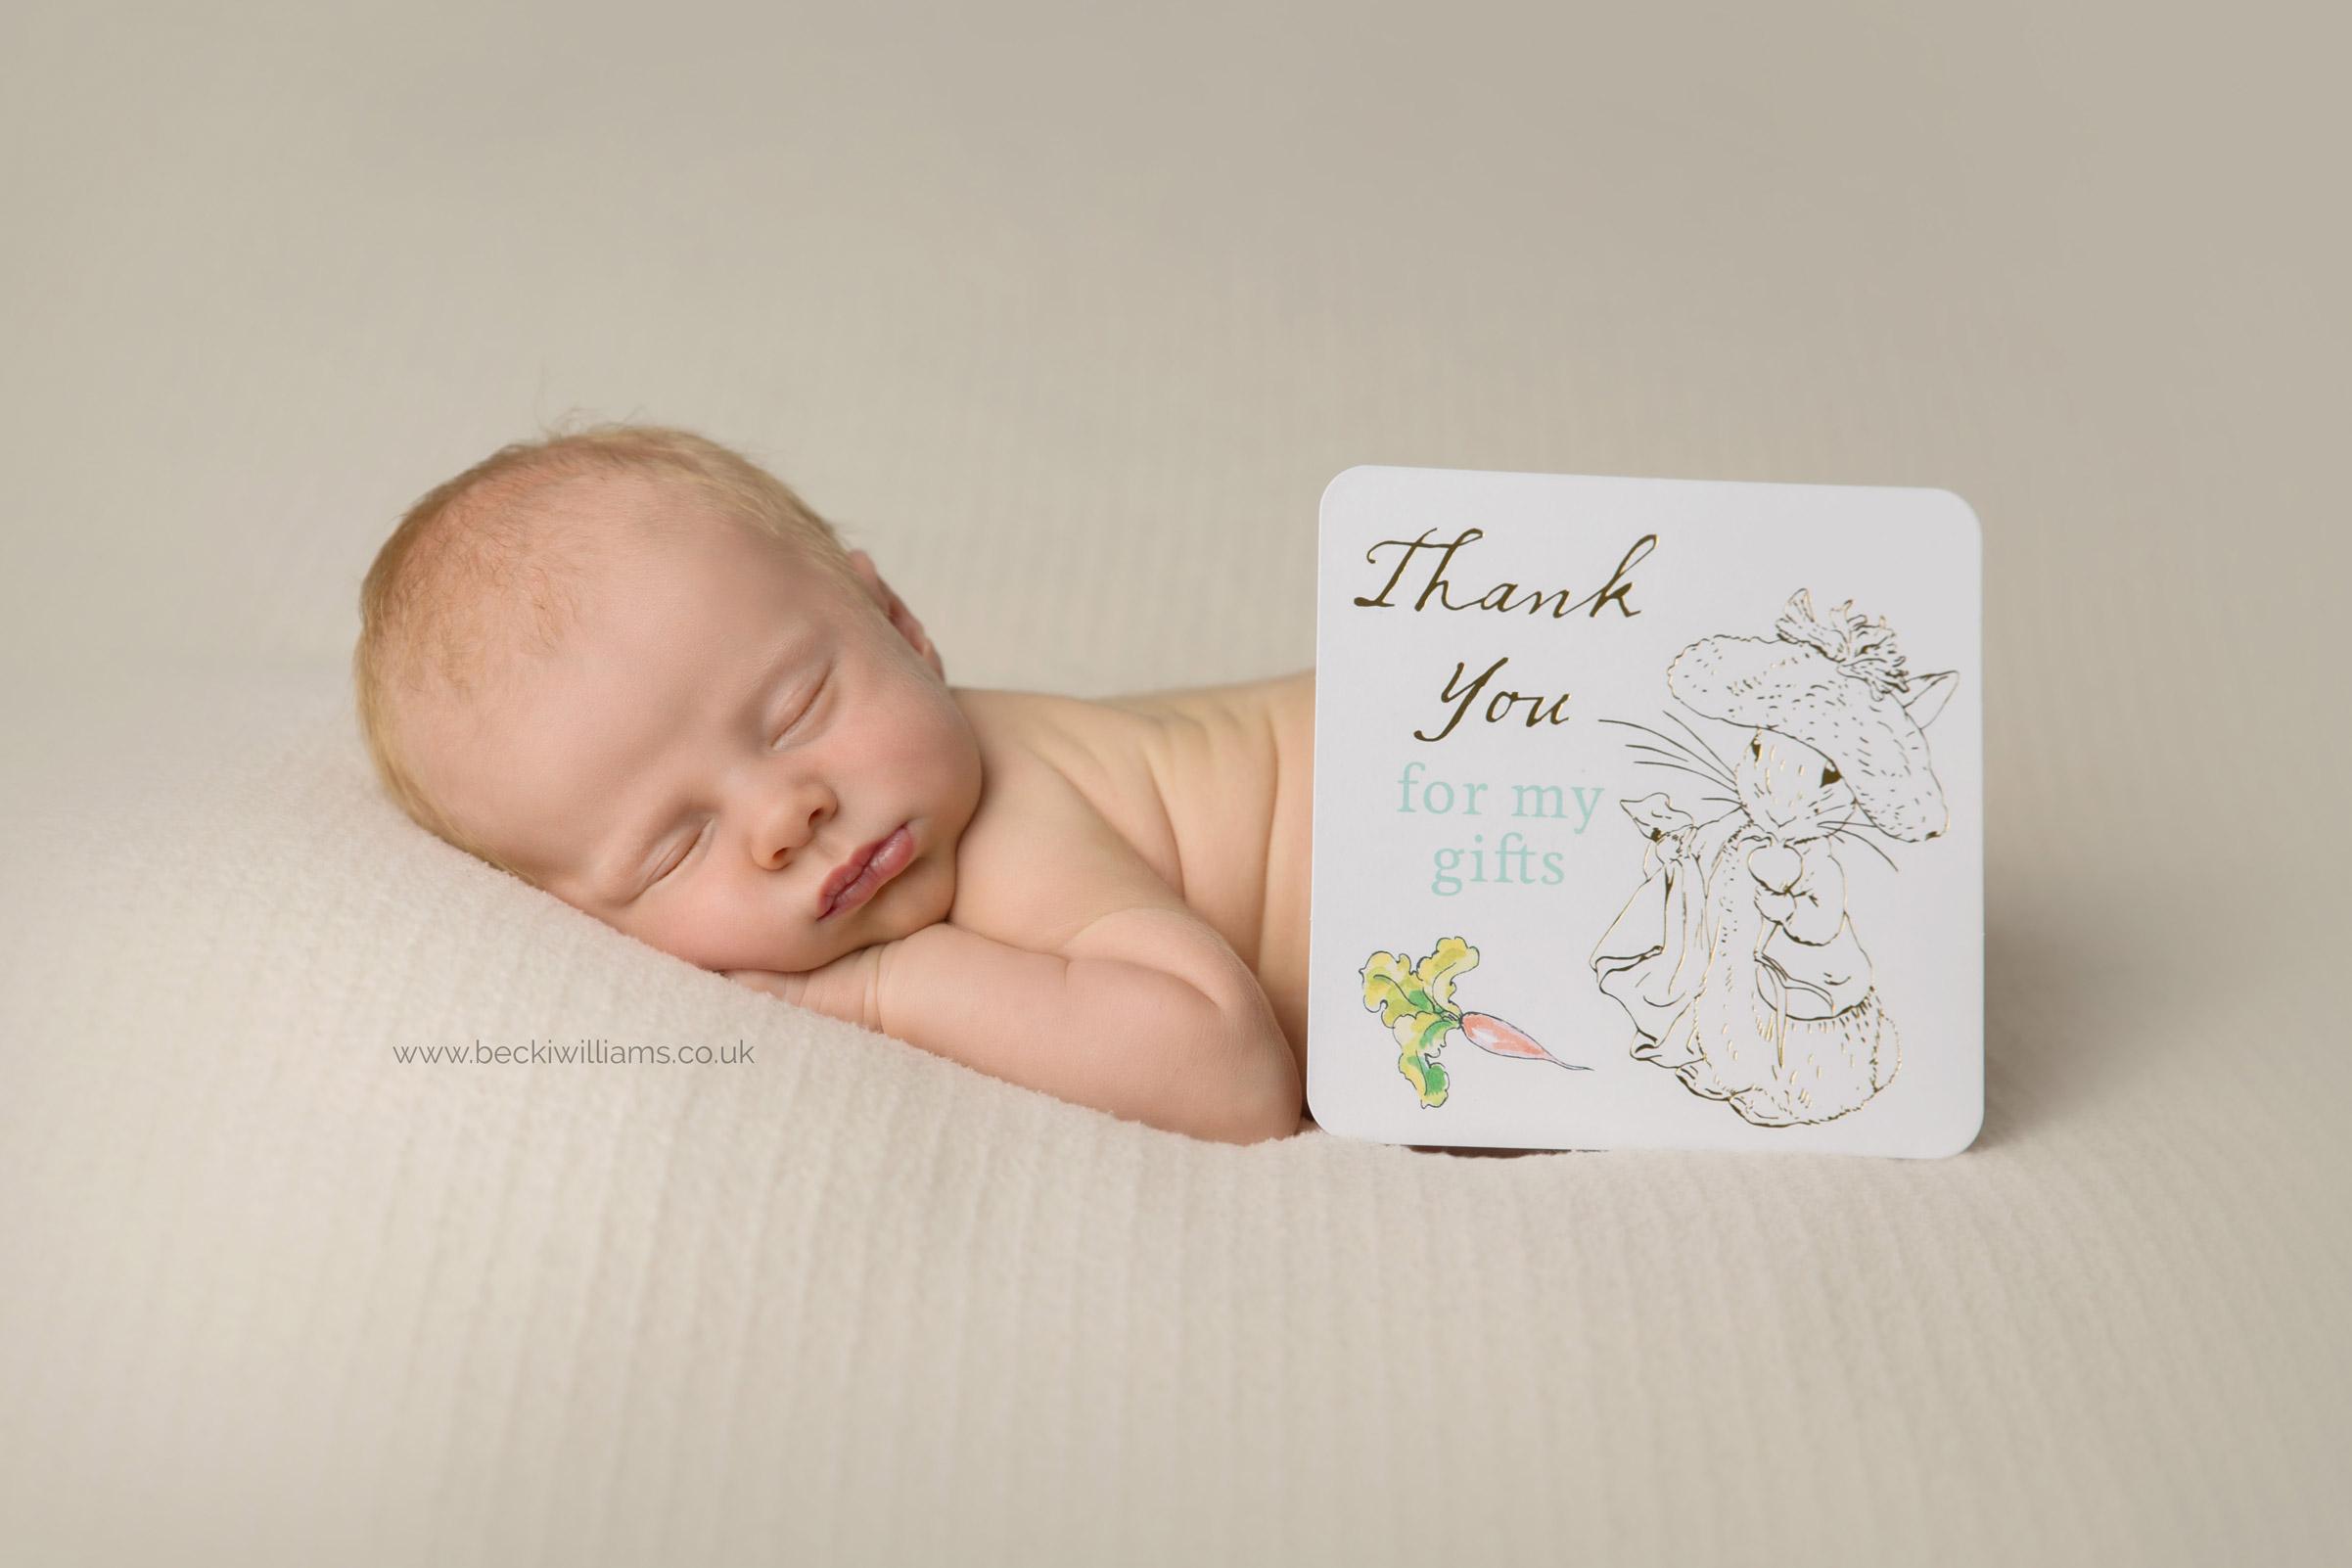 newborn boy sleeps on his tummy with a thank you card